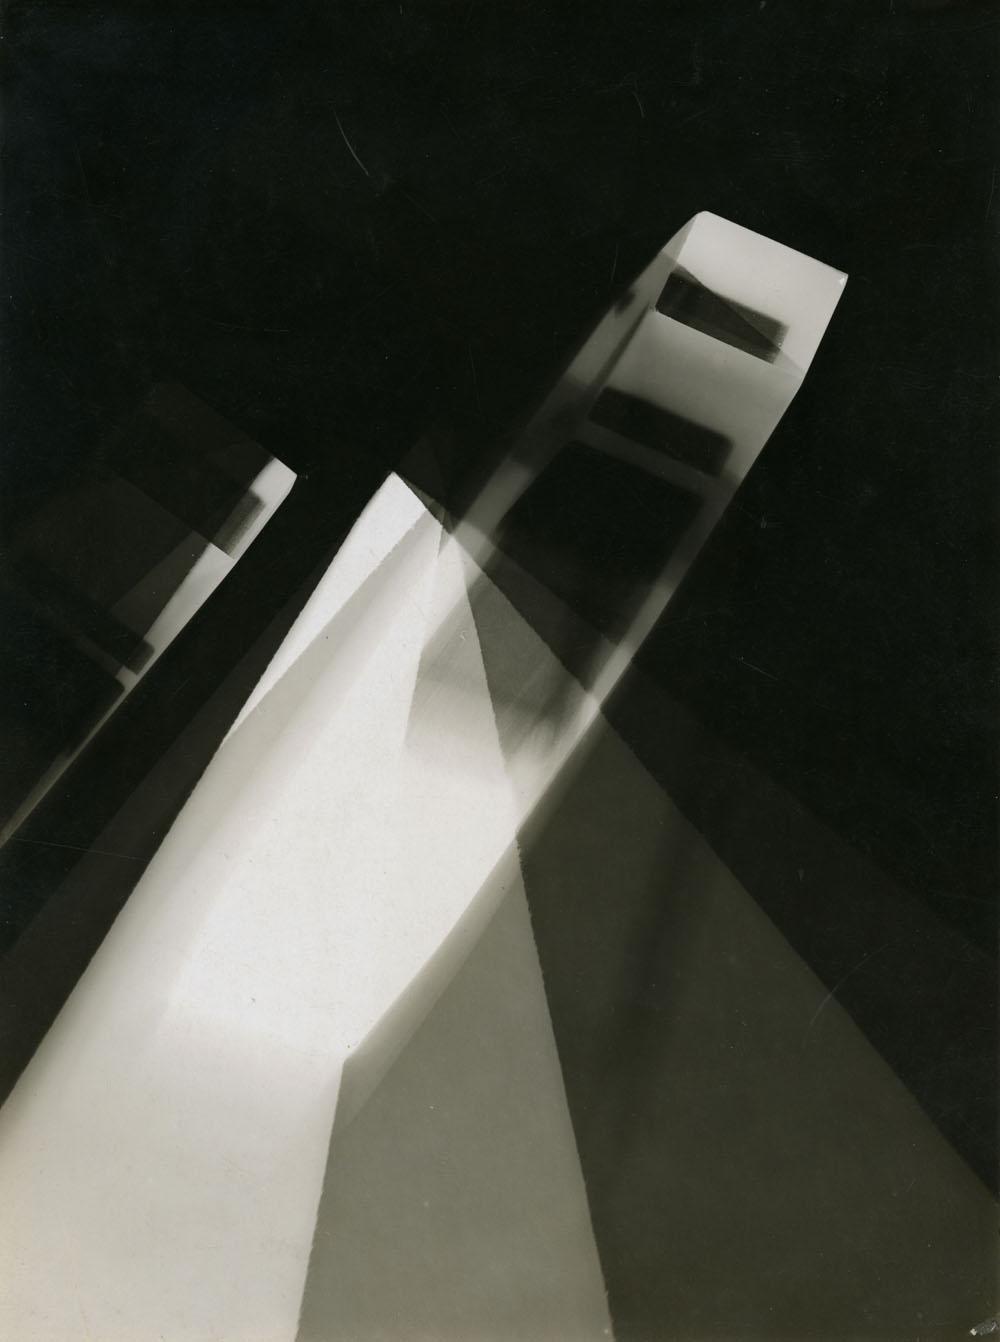 Licht Bilder: Fritz Winter And Abstract Photography László Moholy Nagy,  Untitled (